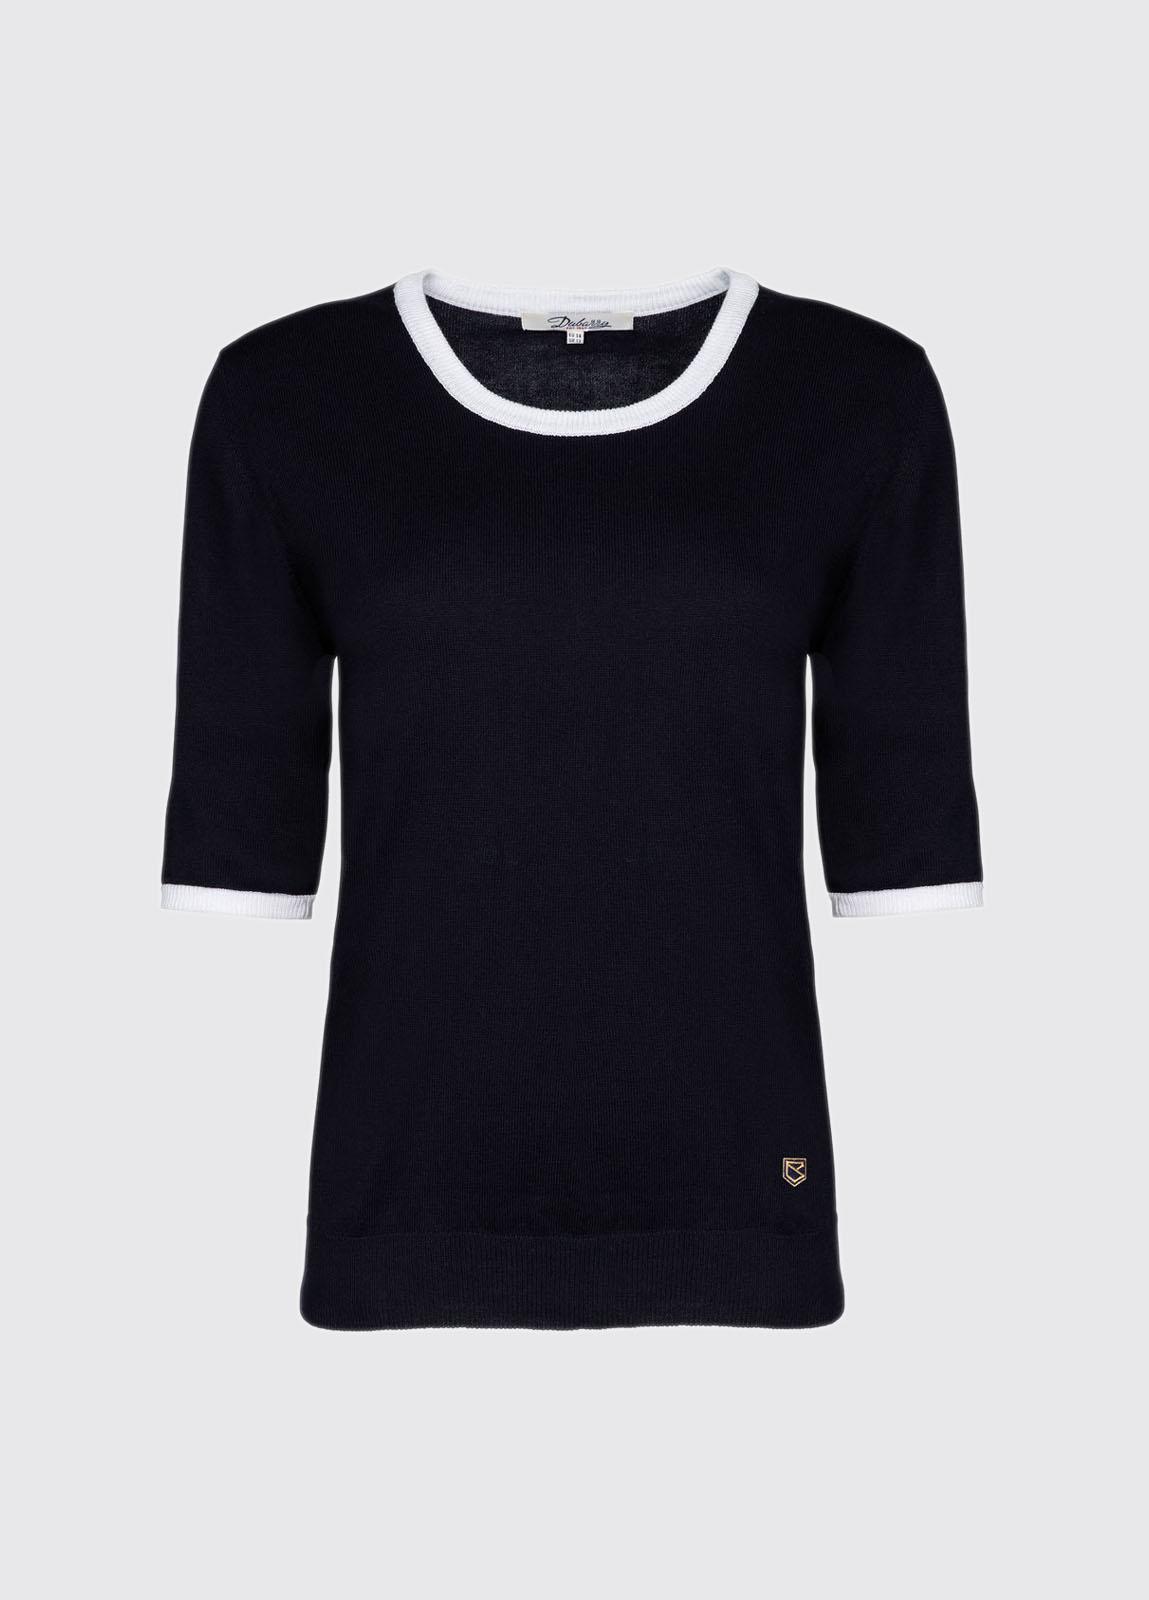 Kilbride Sweater - Navy